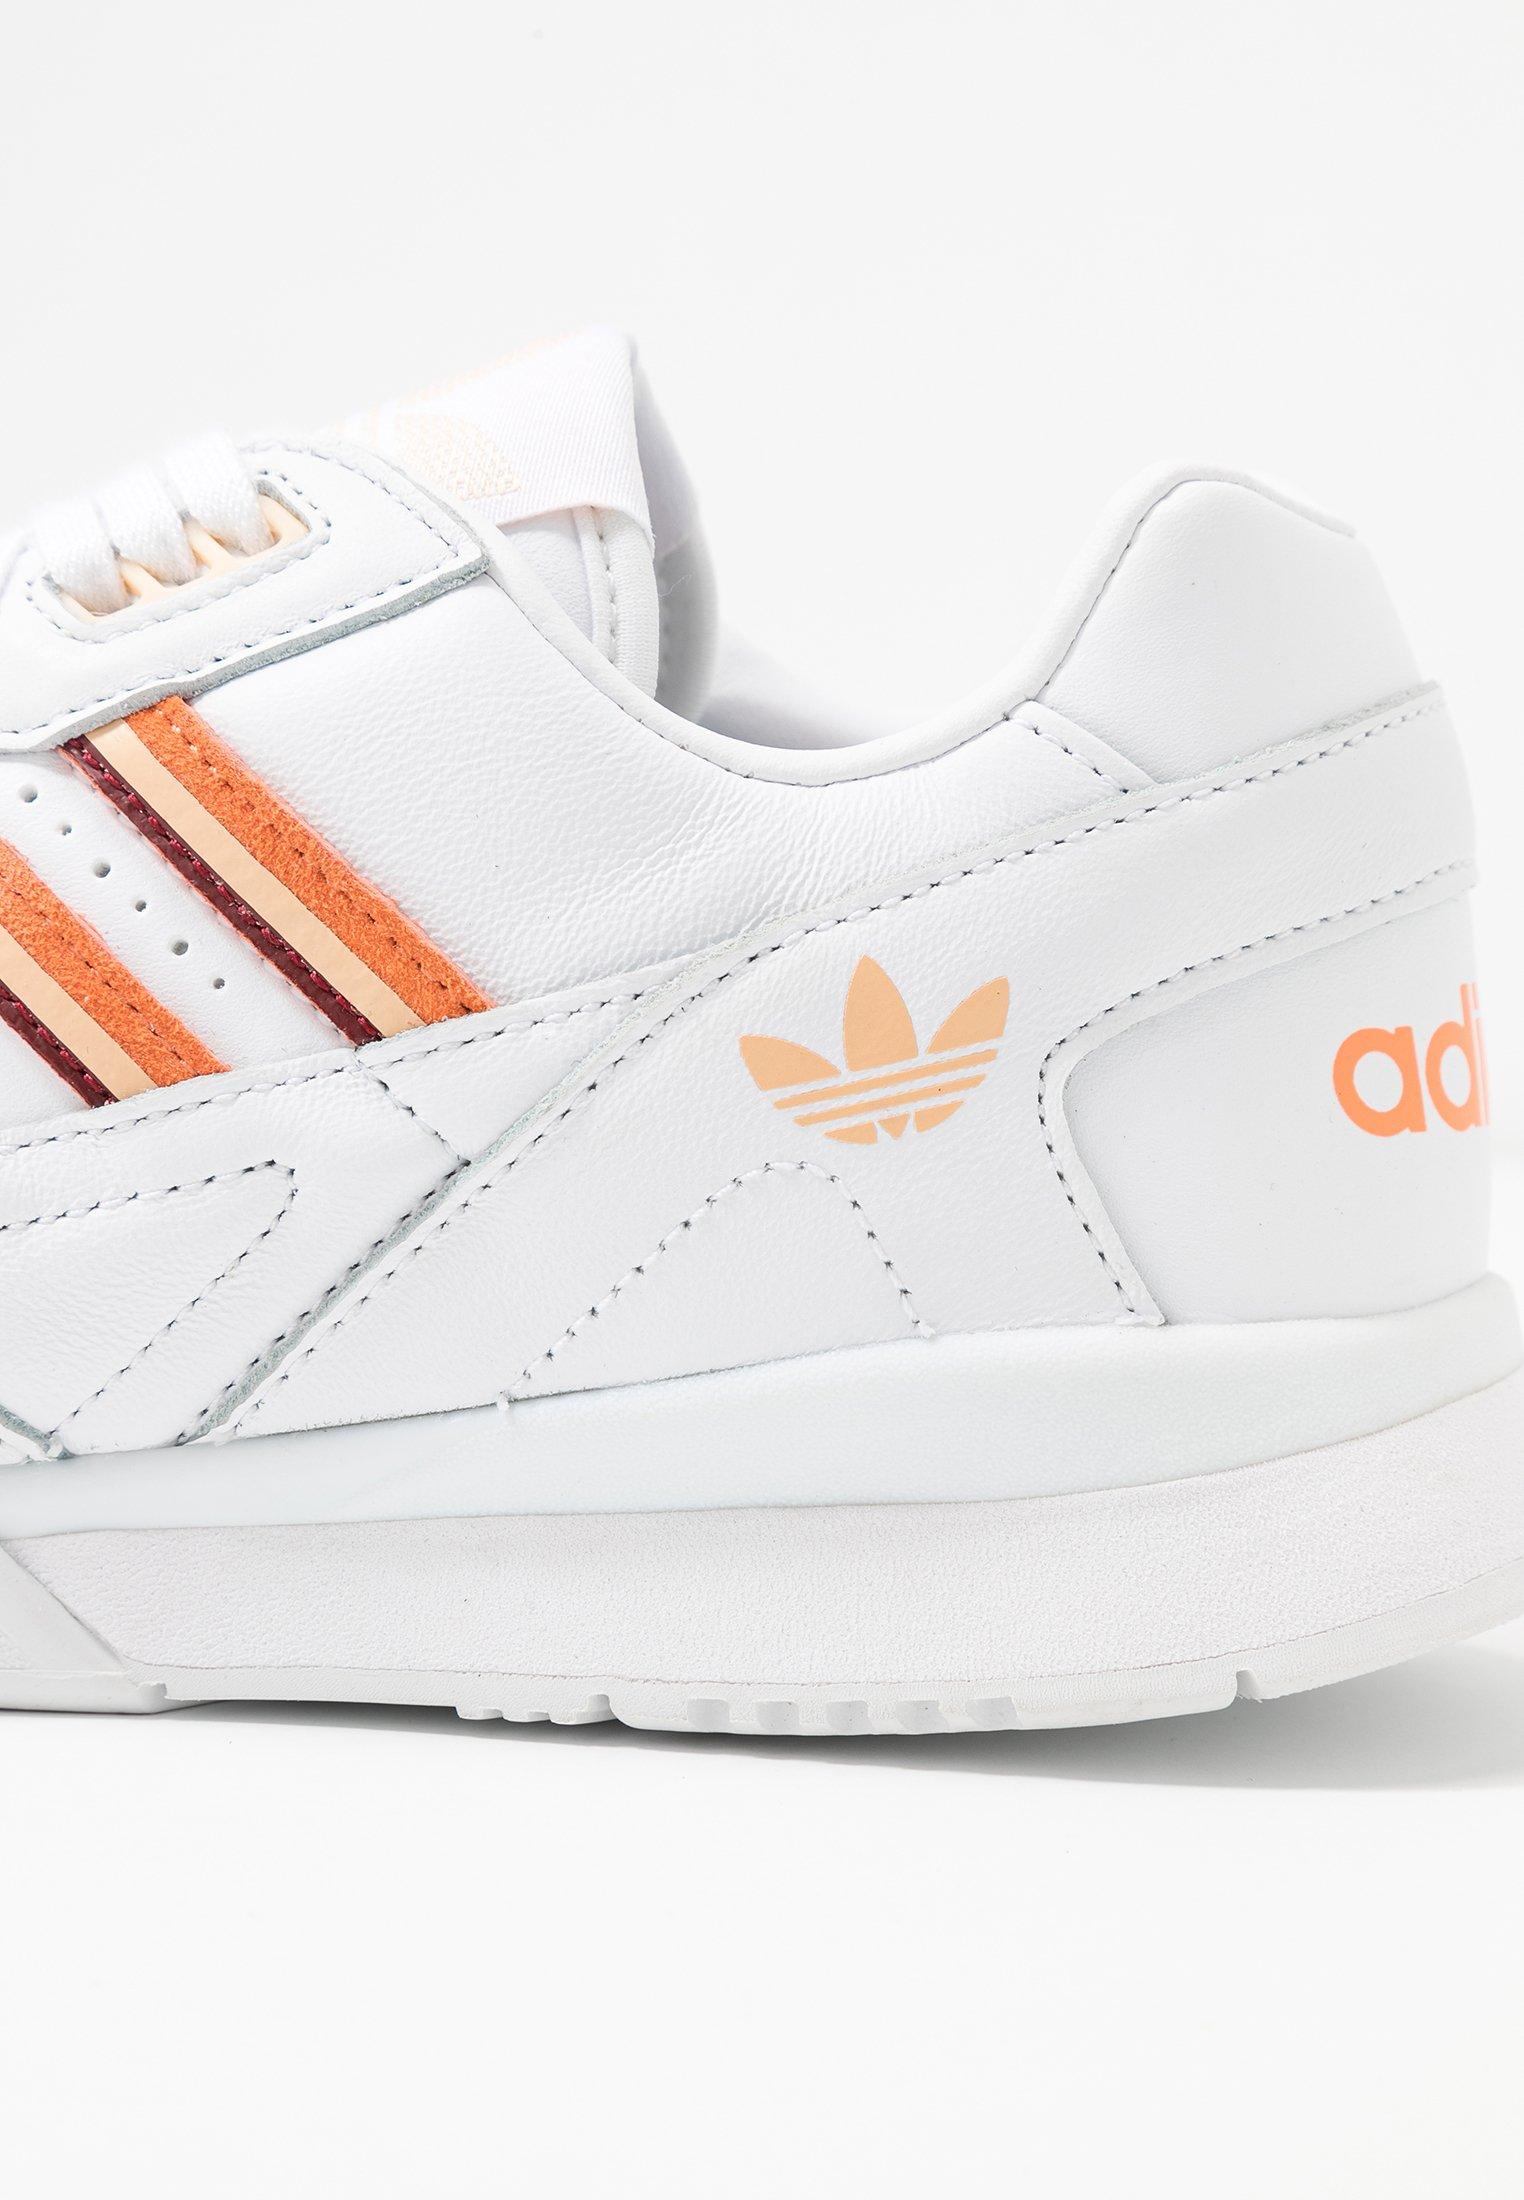 Adidas Originals A.r. Trainer - Sneakers Laag Footwear White/amber Tint/glow Orange Goedkope Schoenen